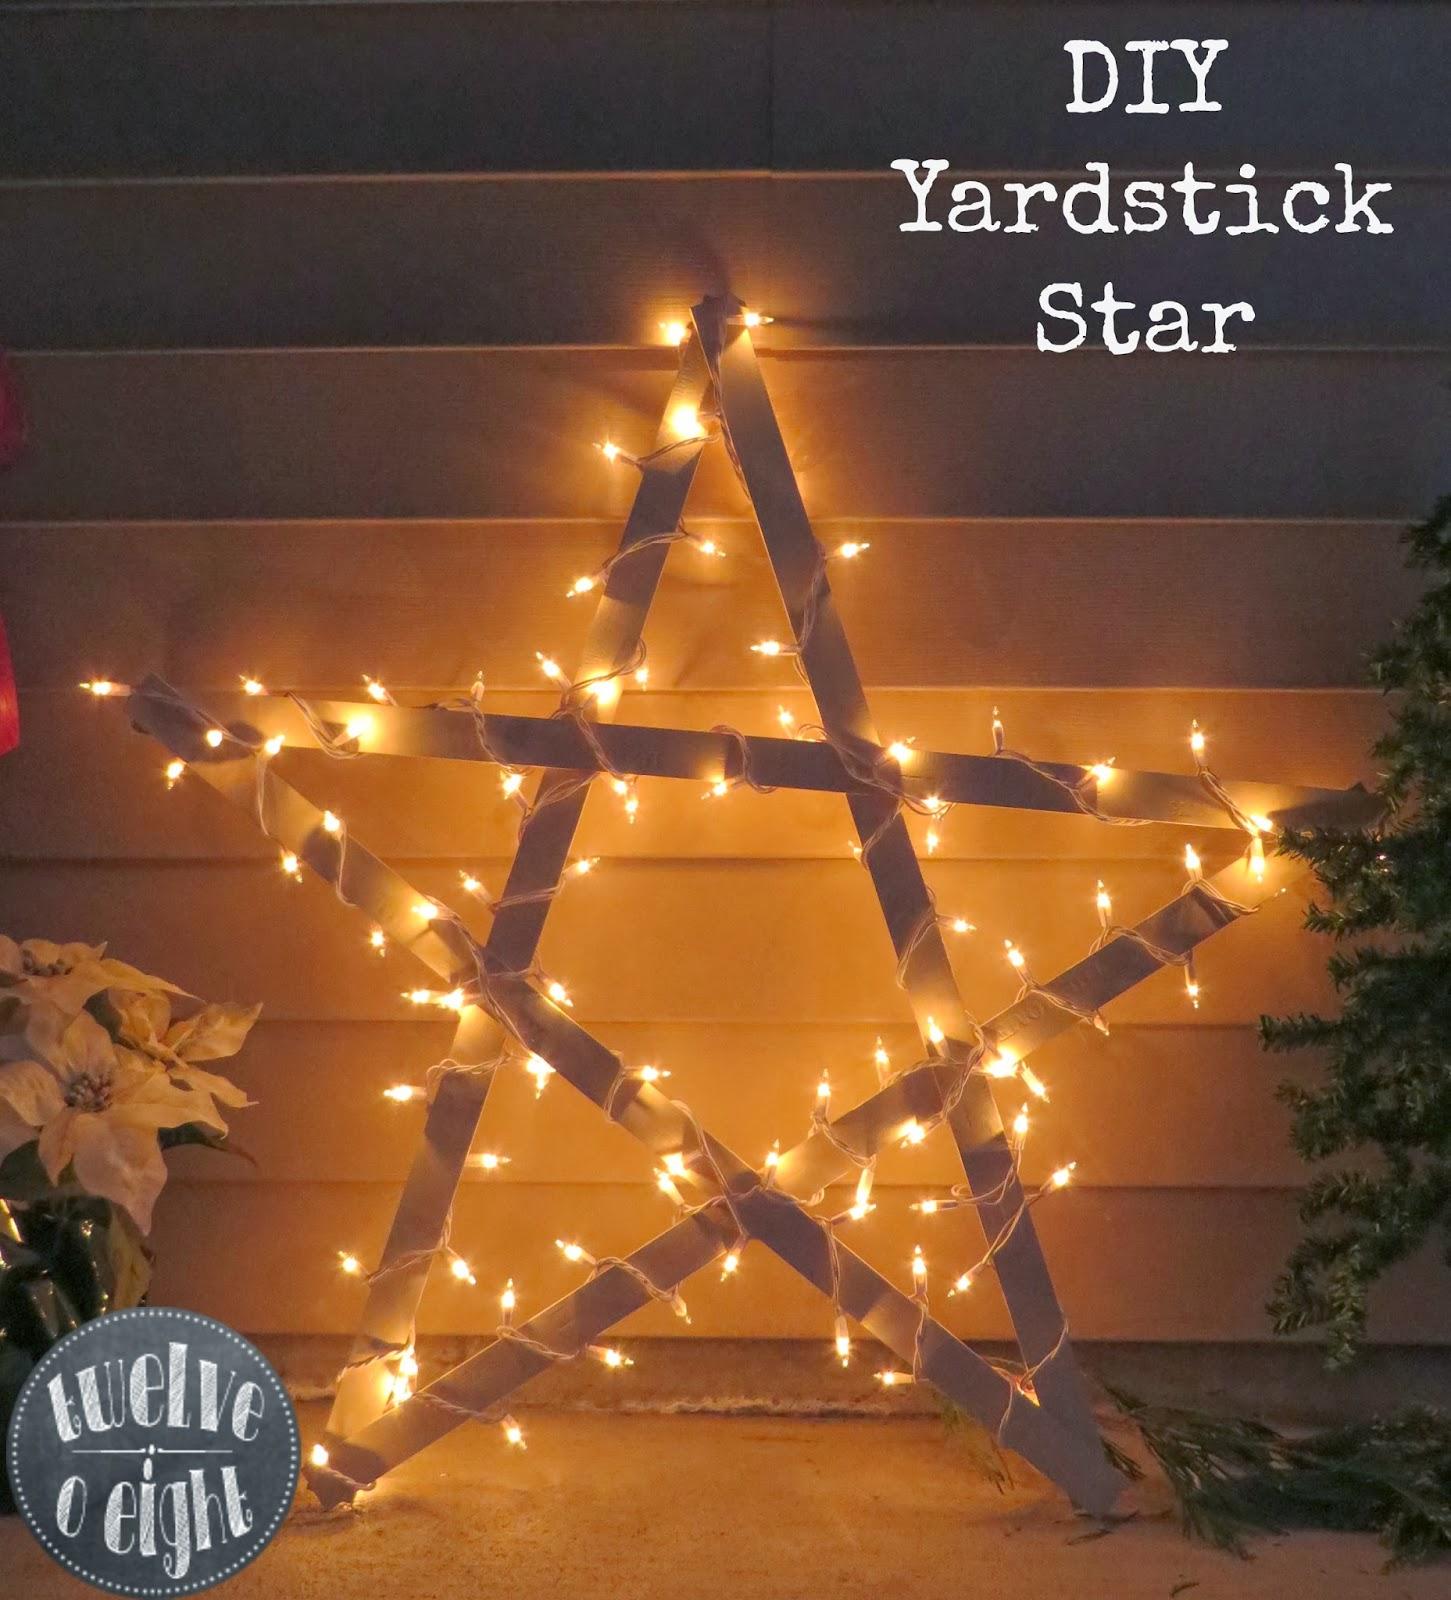 DIY Yardstick Star from Twelve O Eight